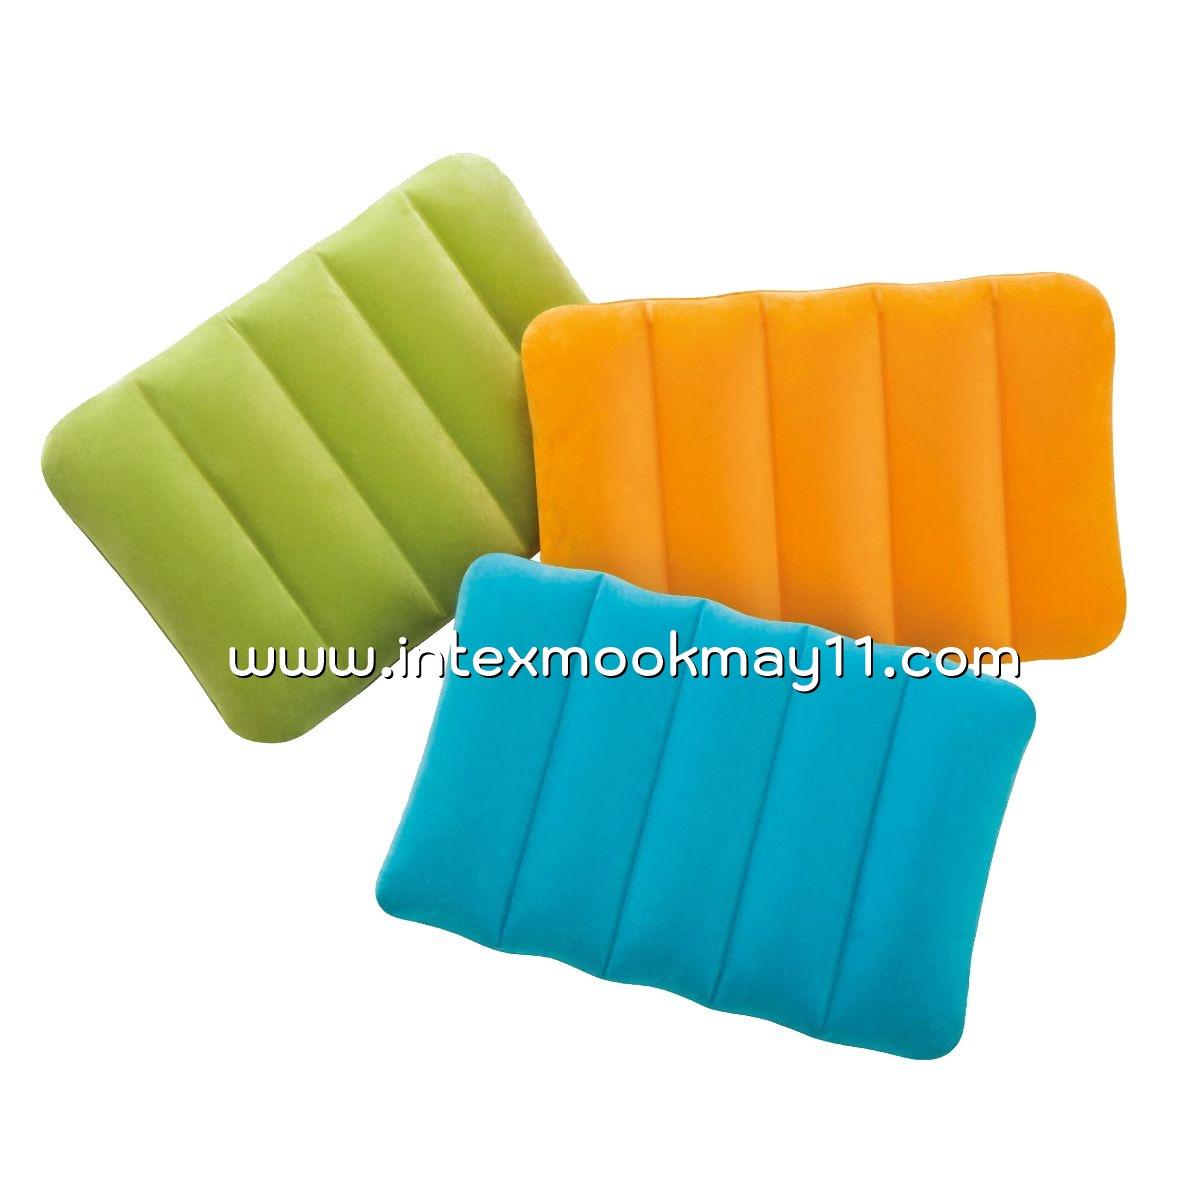 Intex Colorful Medium Pillow หมอนหลากสี